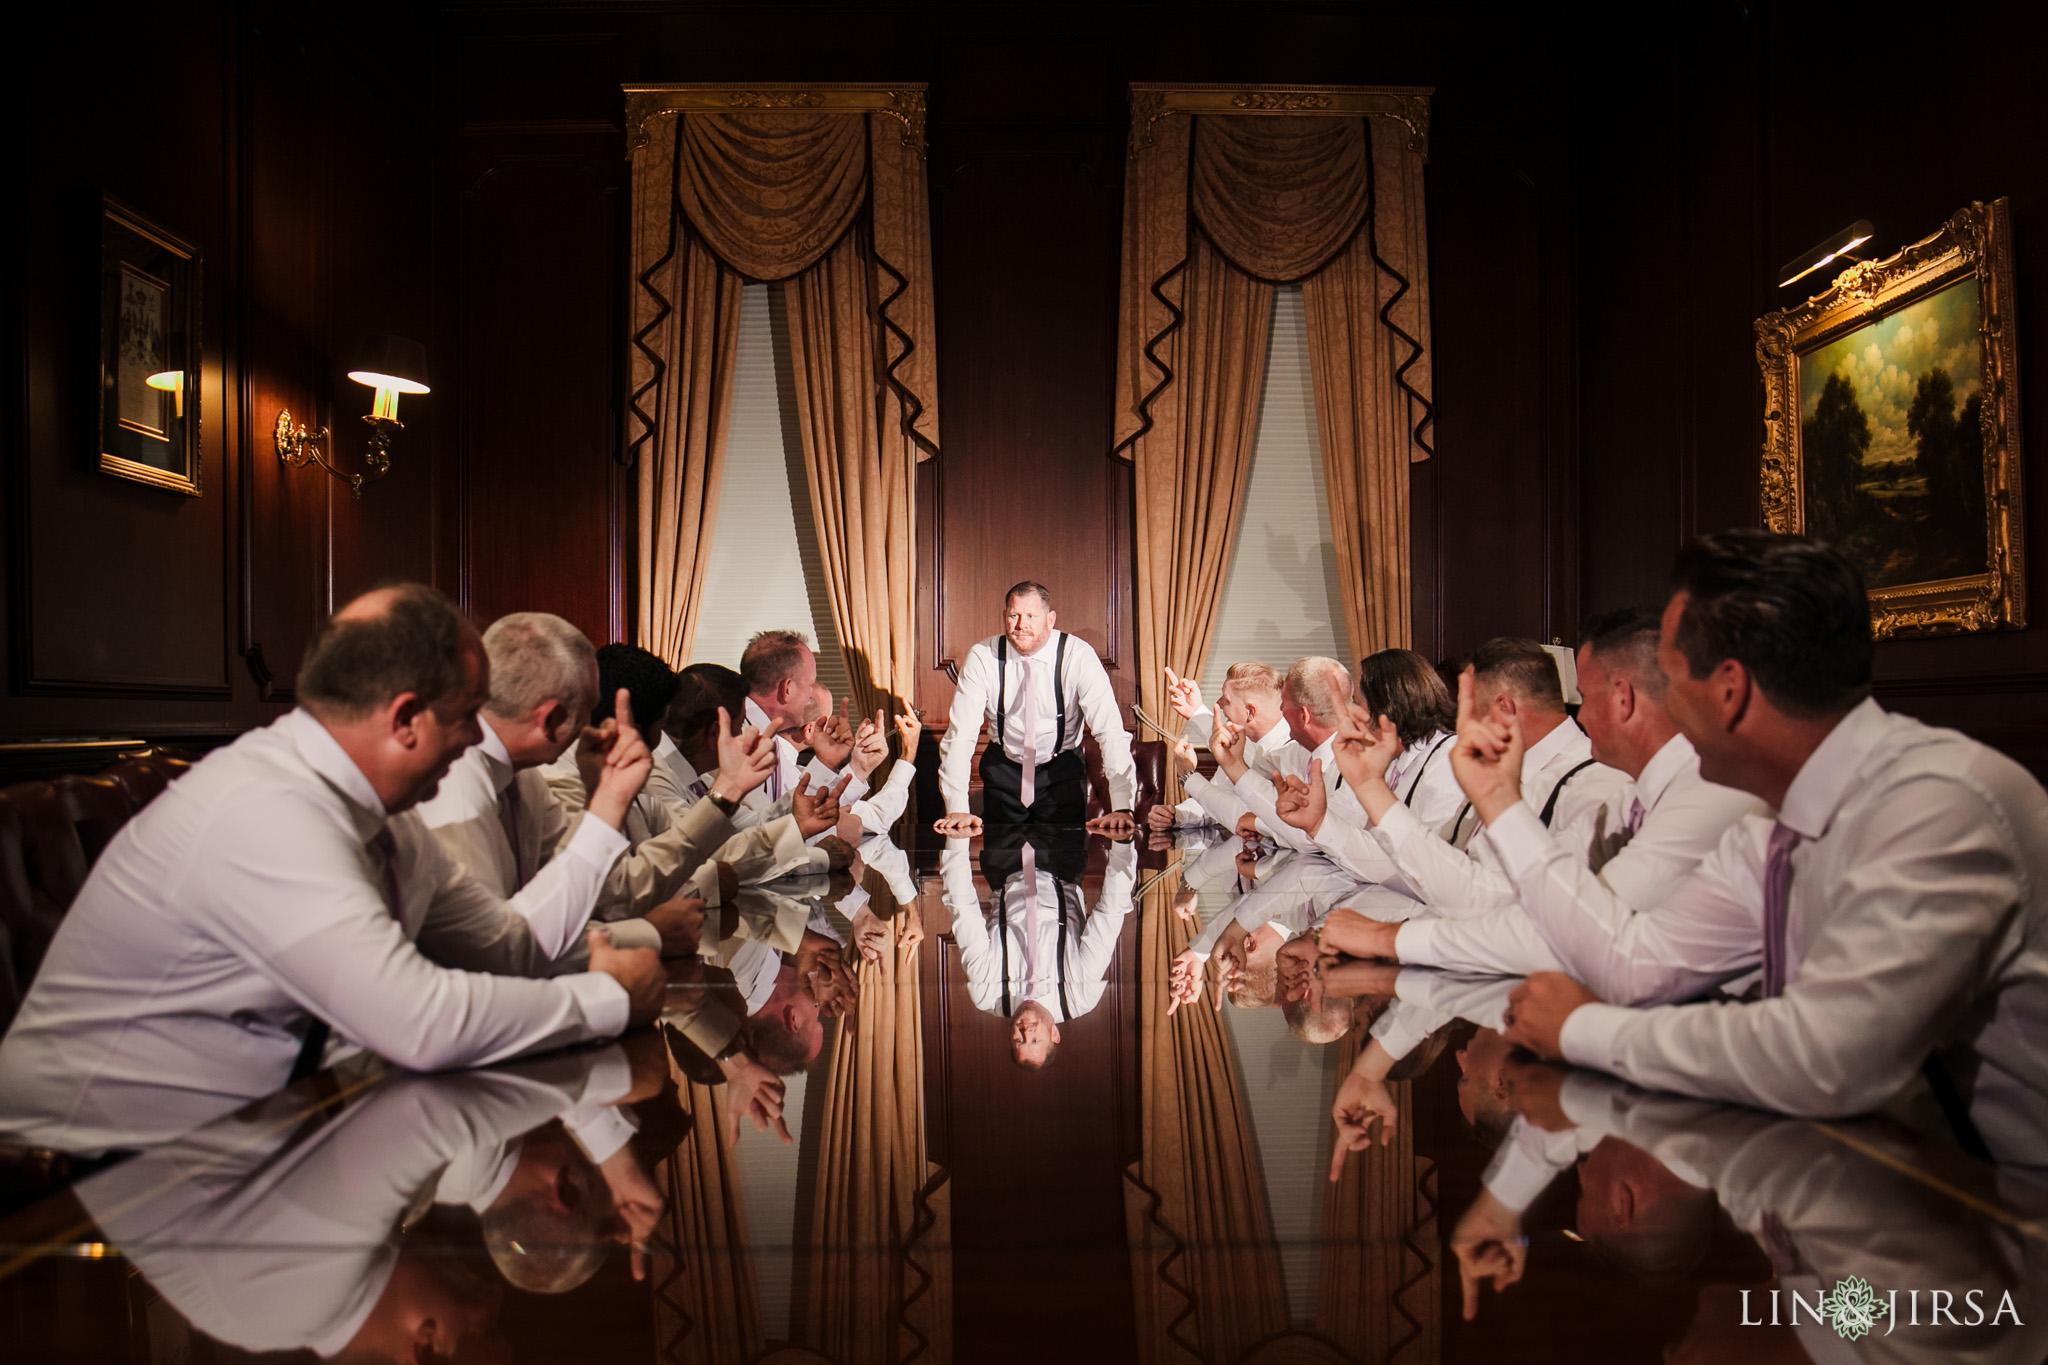 045 sherwood country club indian groomsmen wedding photography